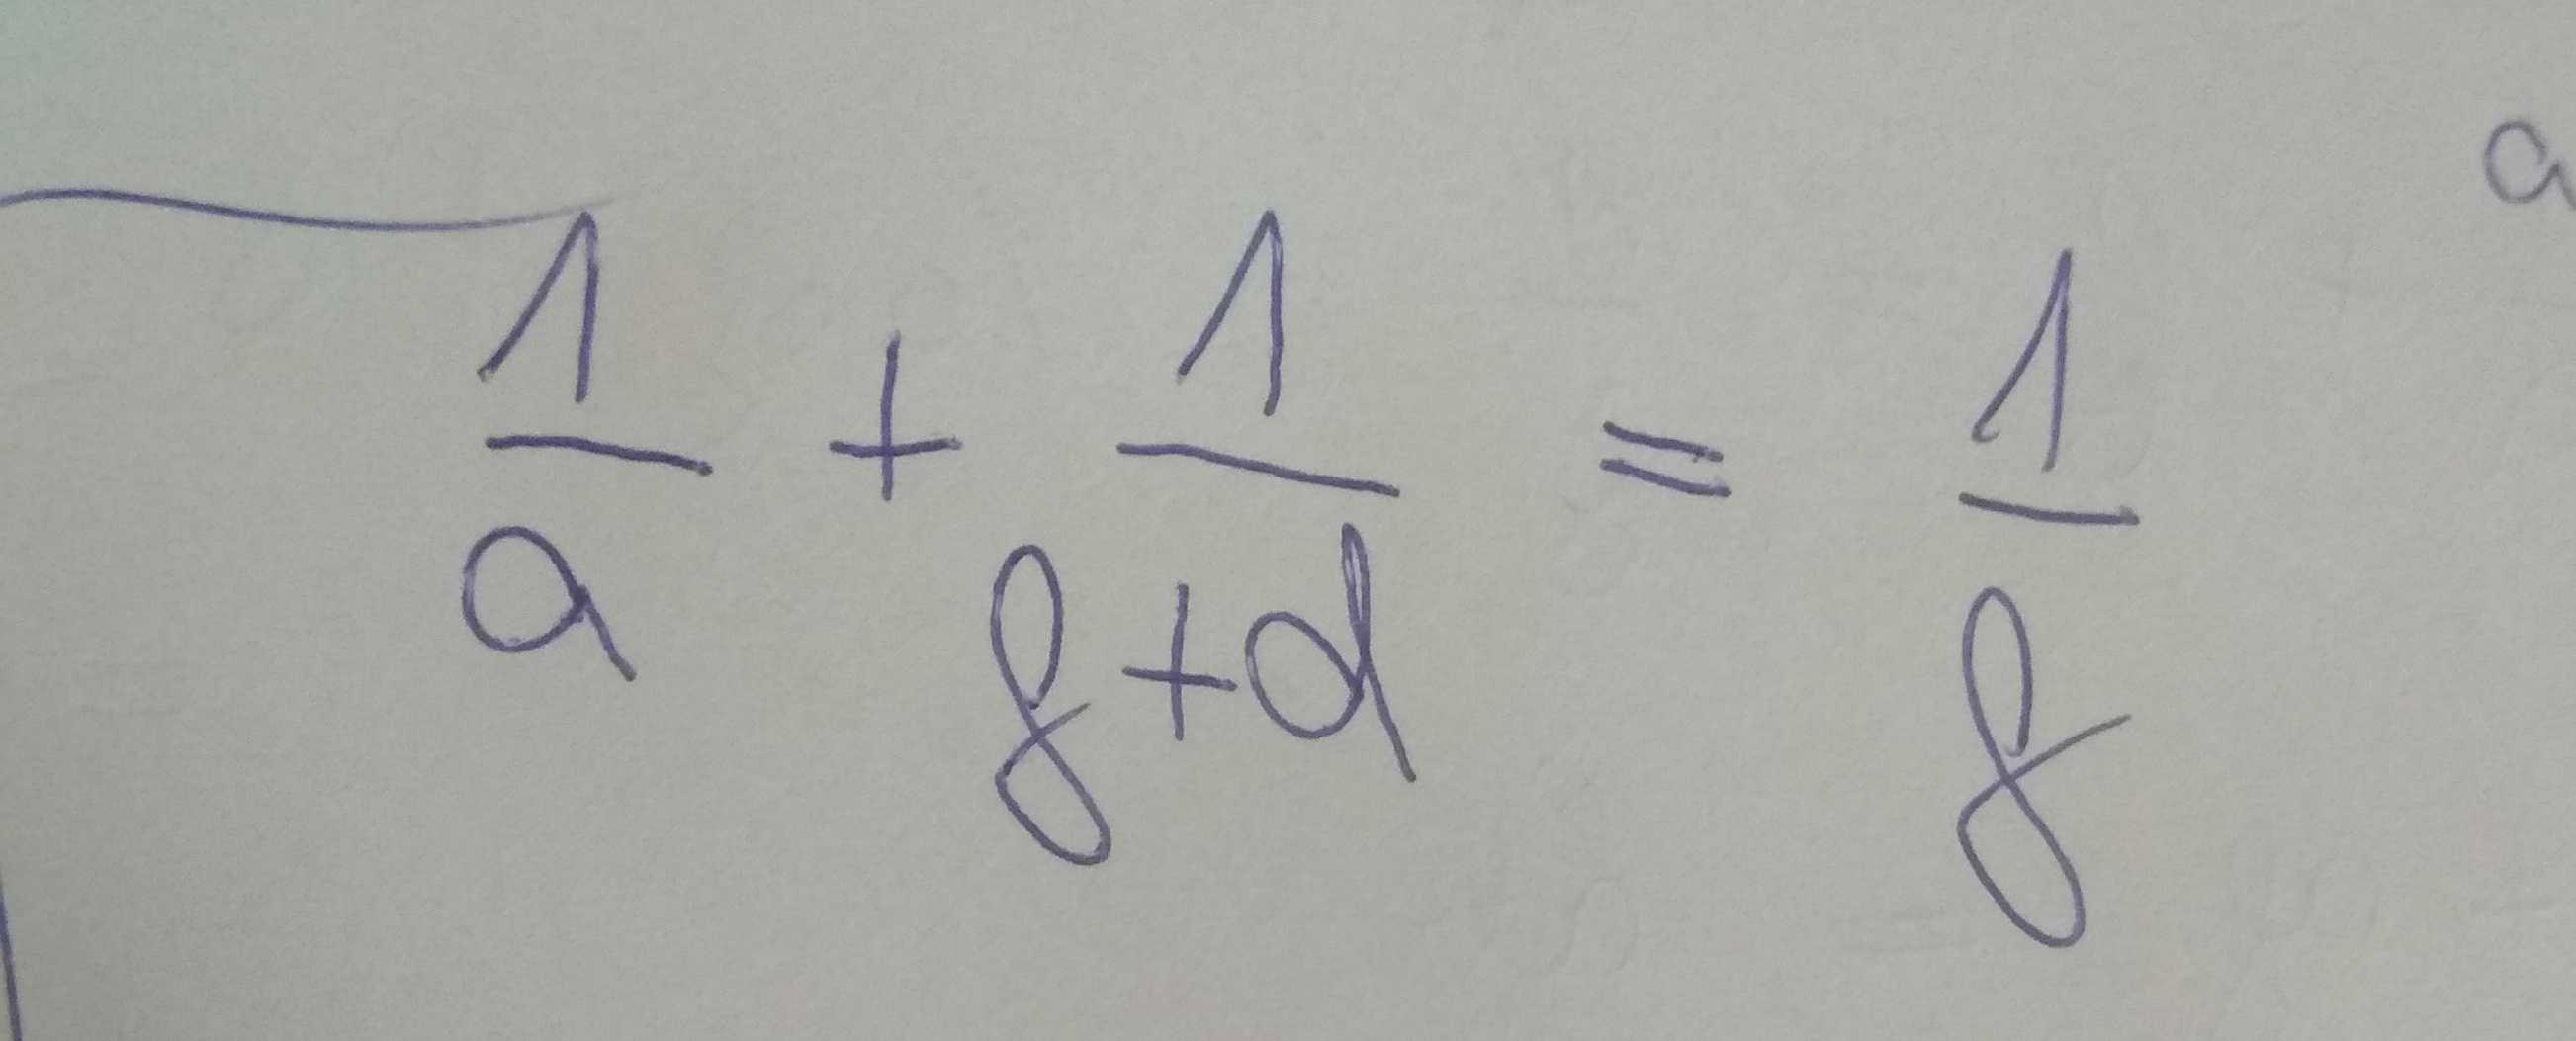 http://forum.matematika.cz/upload3/img/2019-02/25559_IMG_20190210_134200.jpg